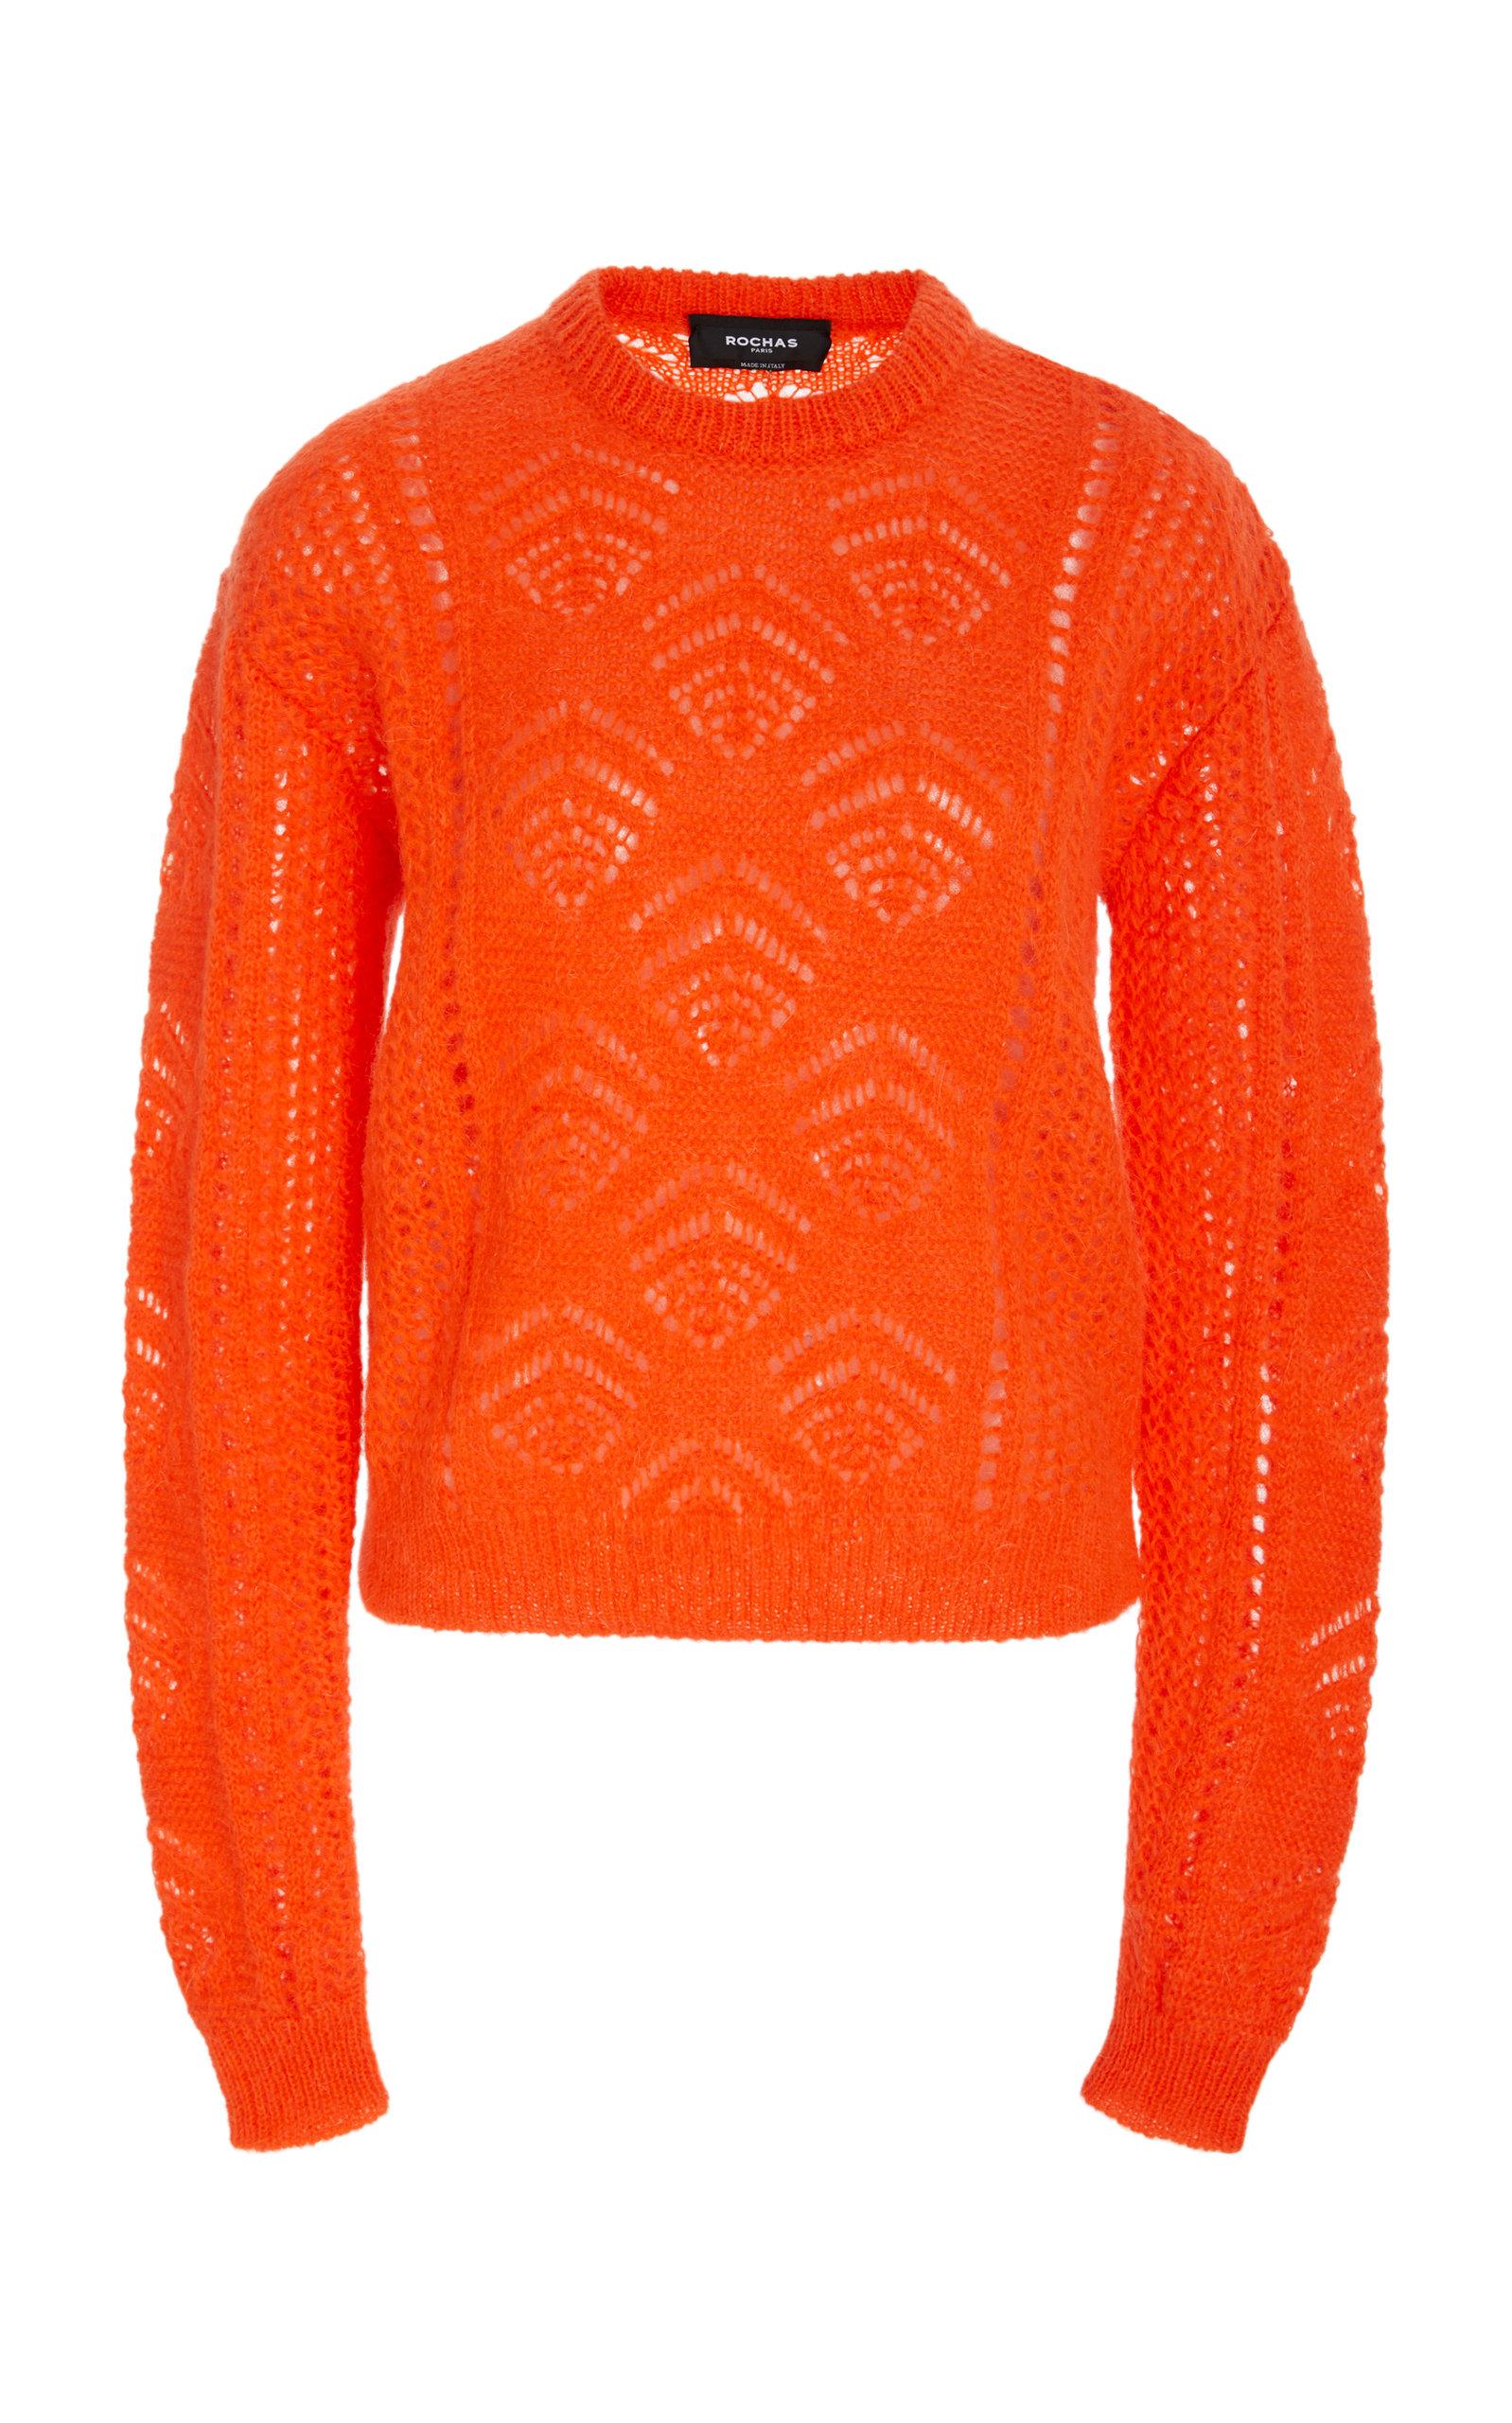 ROCHAS Scarf Neck Chunky-Knit Sweater in Orange